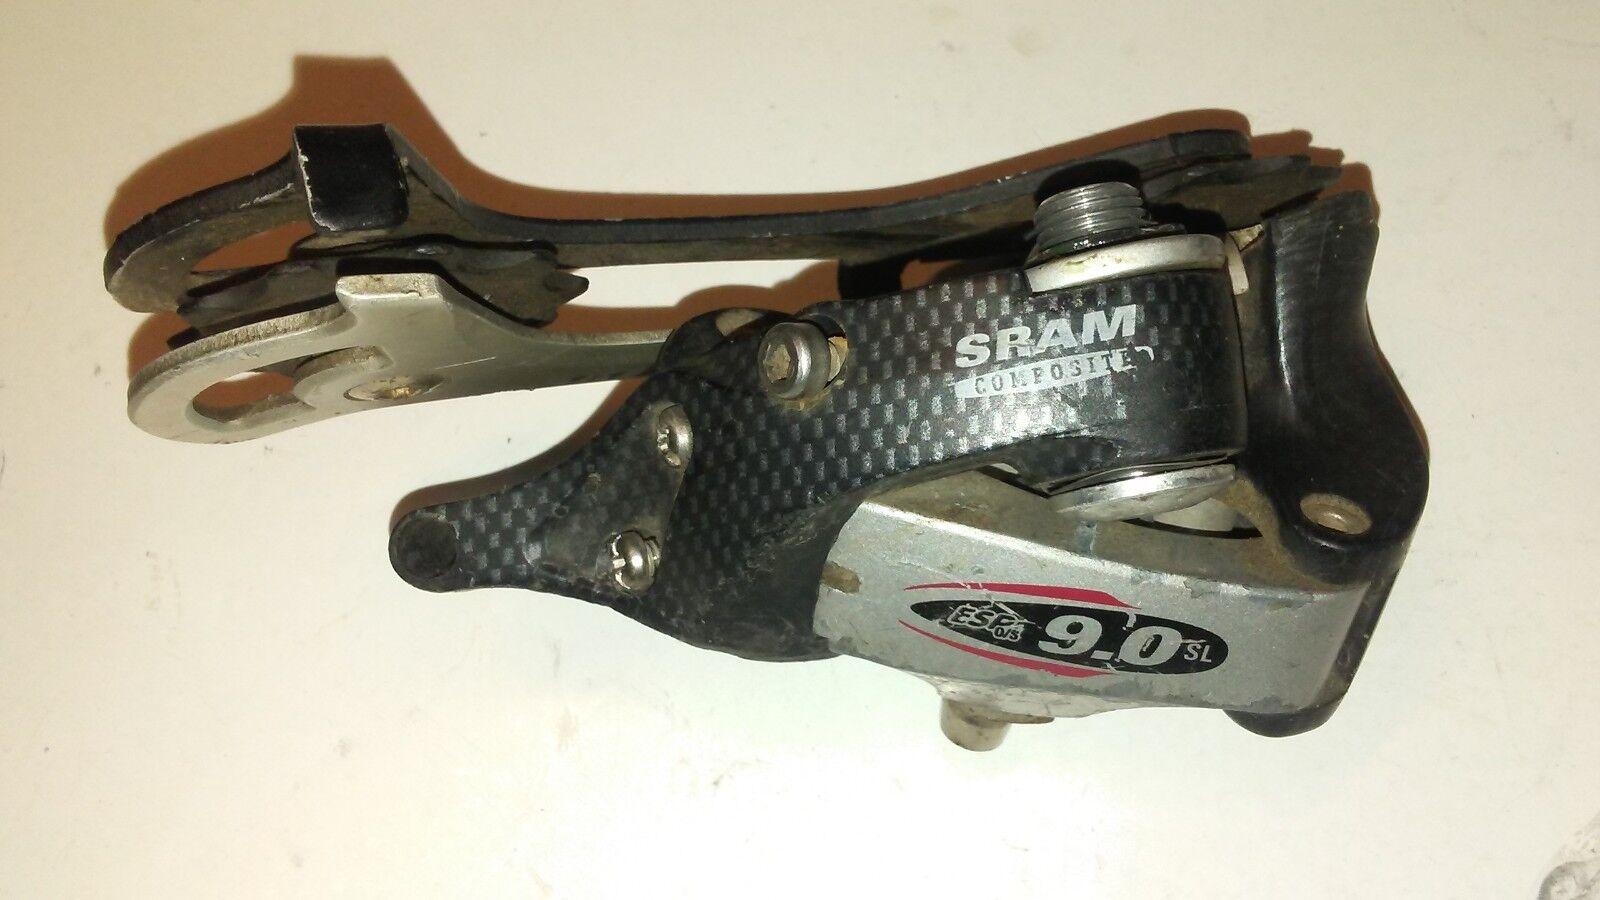 SRAM 9.0 SL carbon composites rear derailleur Long cage 9 Speed